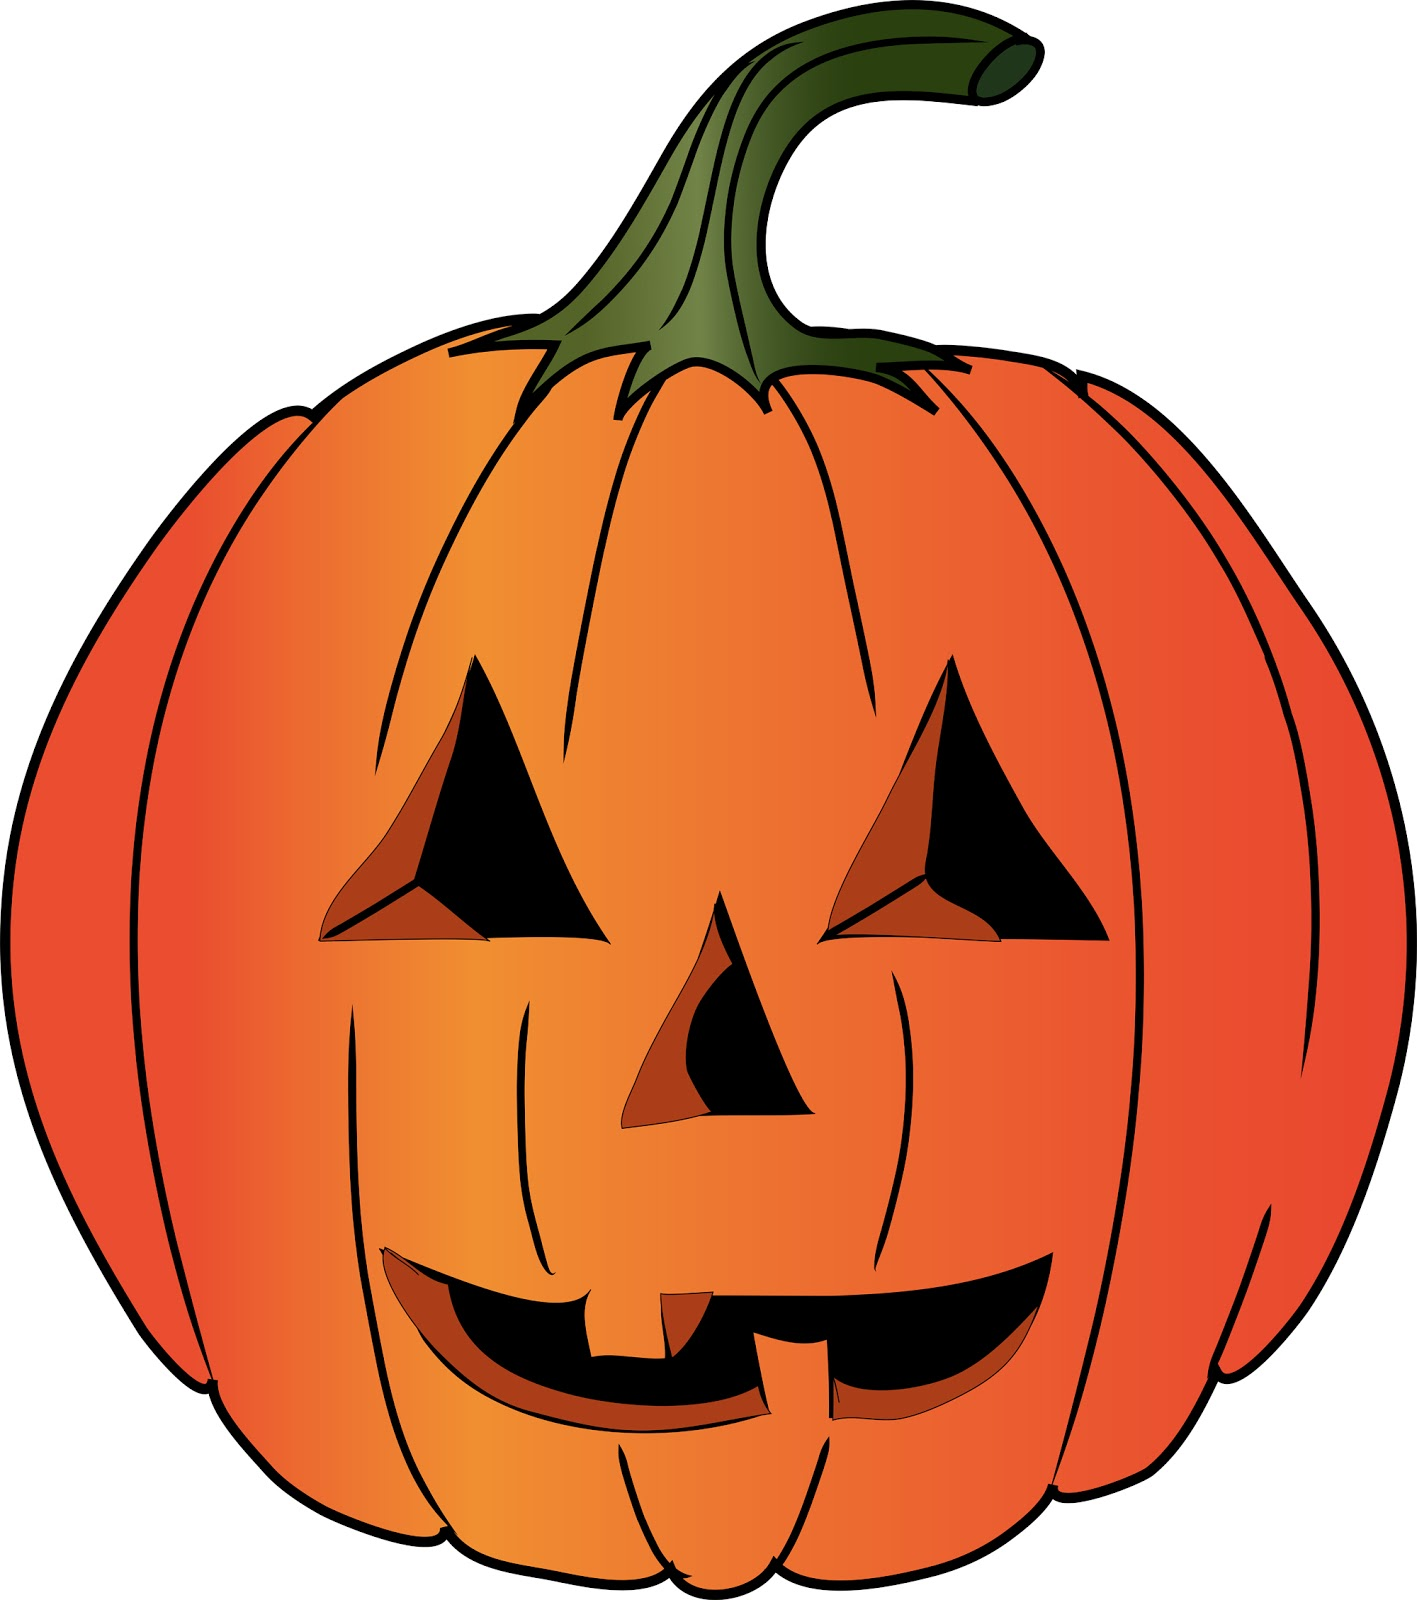 Halloween Pumpkin Carving Clip Art | Clipart Panda - Free ... (1417 x 1600 Pixel)